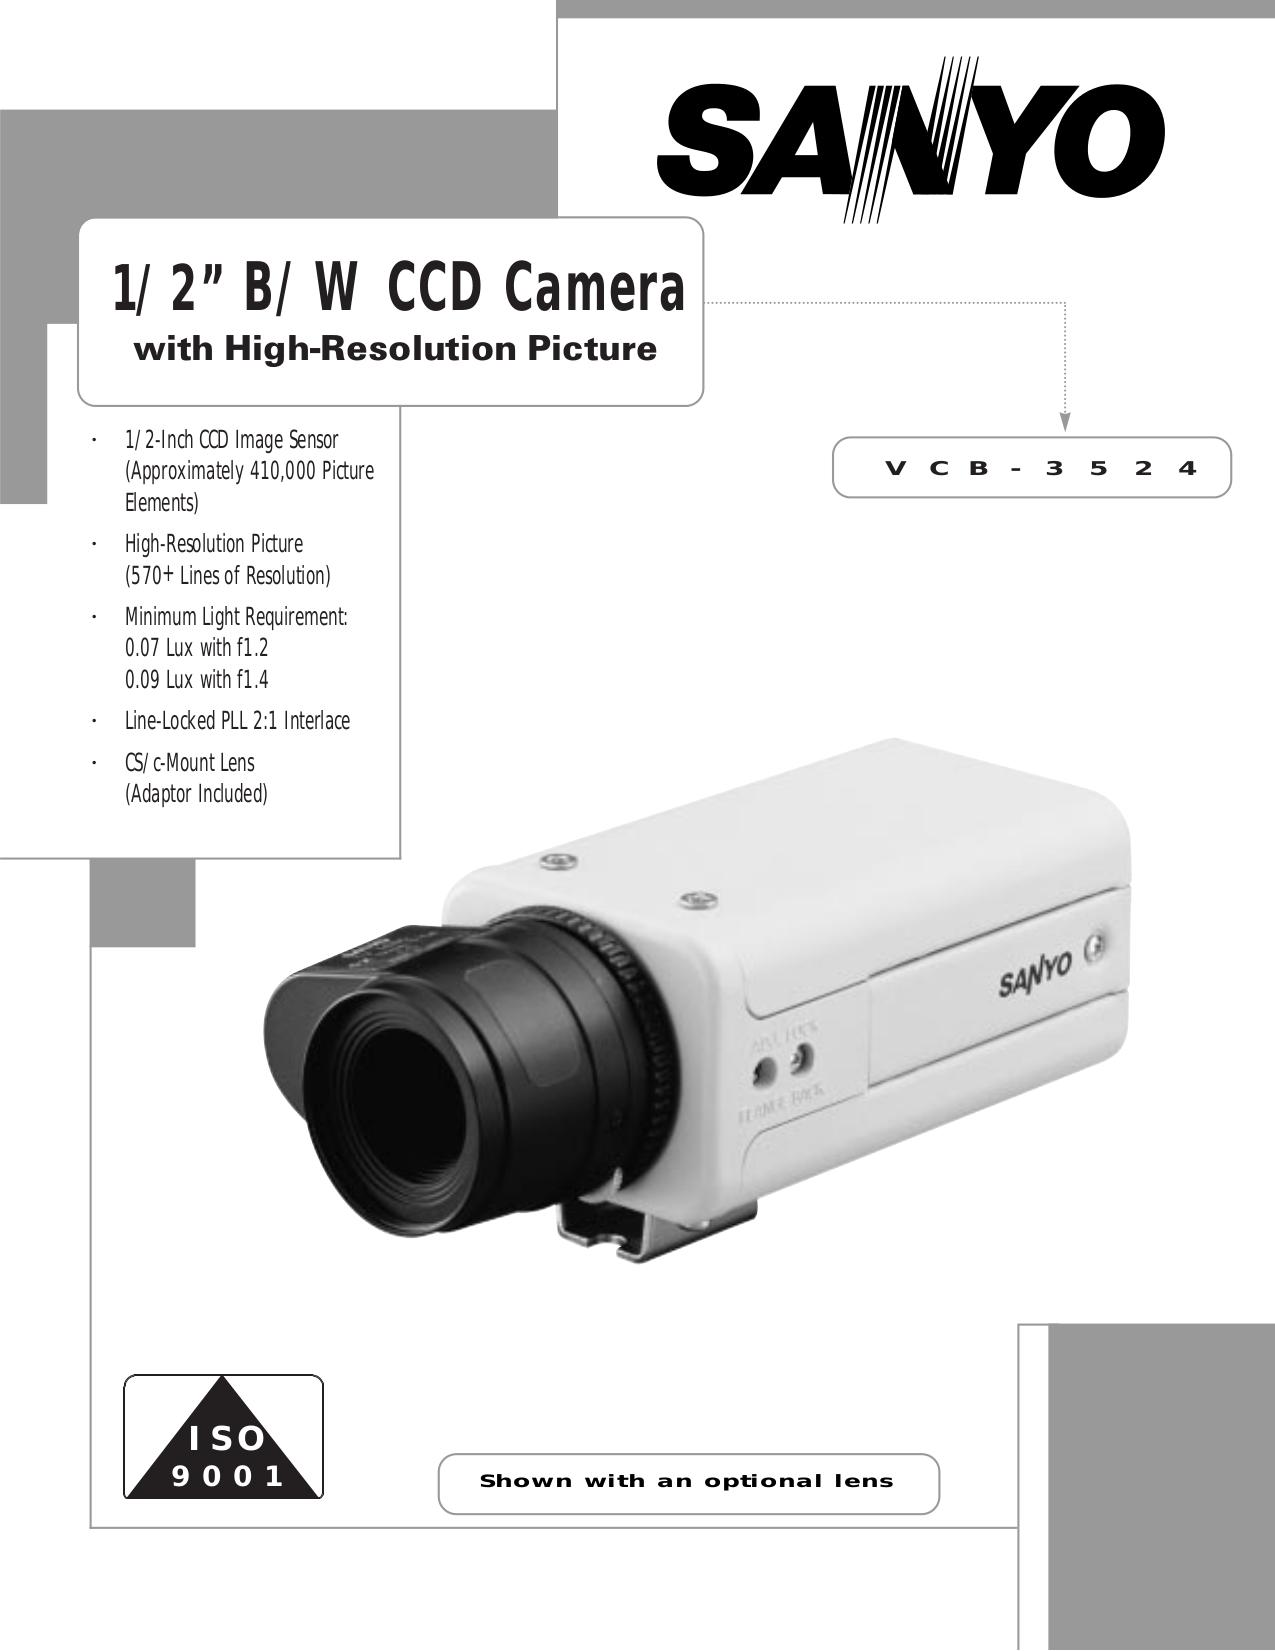 download free pdf for sanyo vcb 3524 security camera manual rh umlib com sony camera manuals free download sony camera manuals to purchase